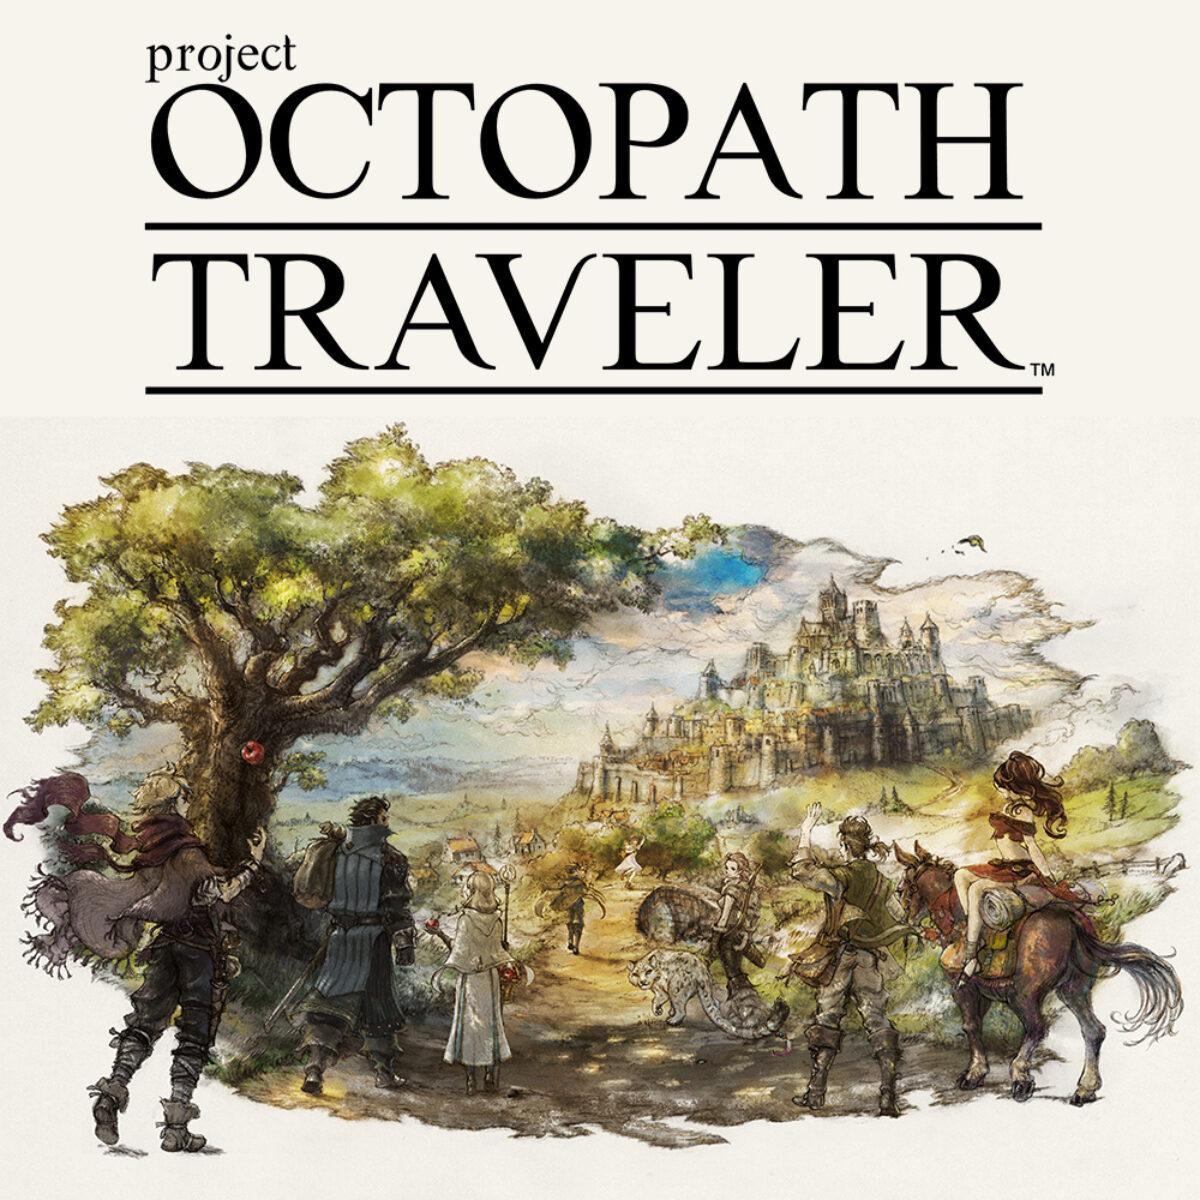 Octopath Traveler, 8 destinées entremêlées